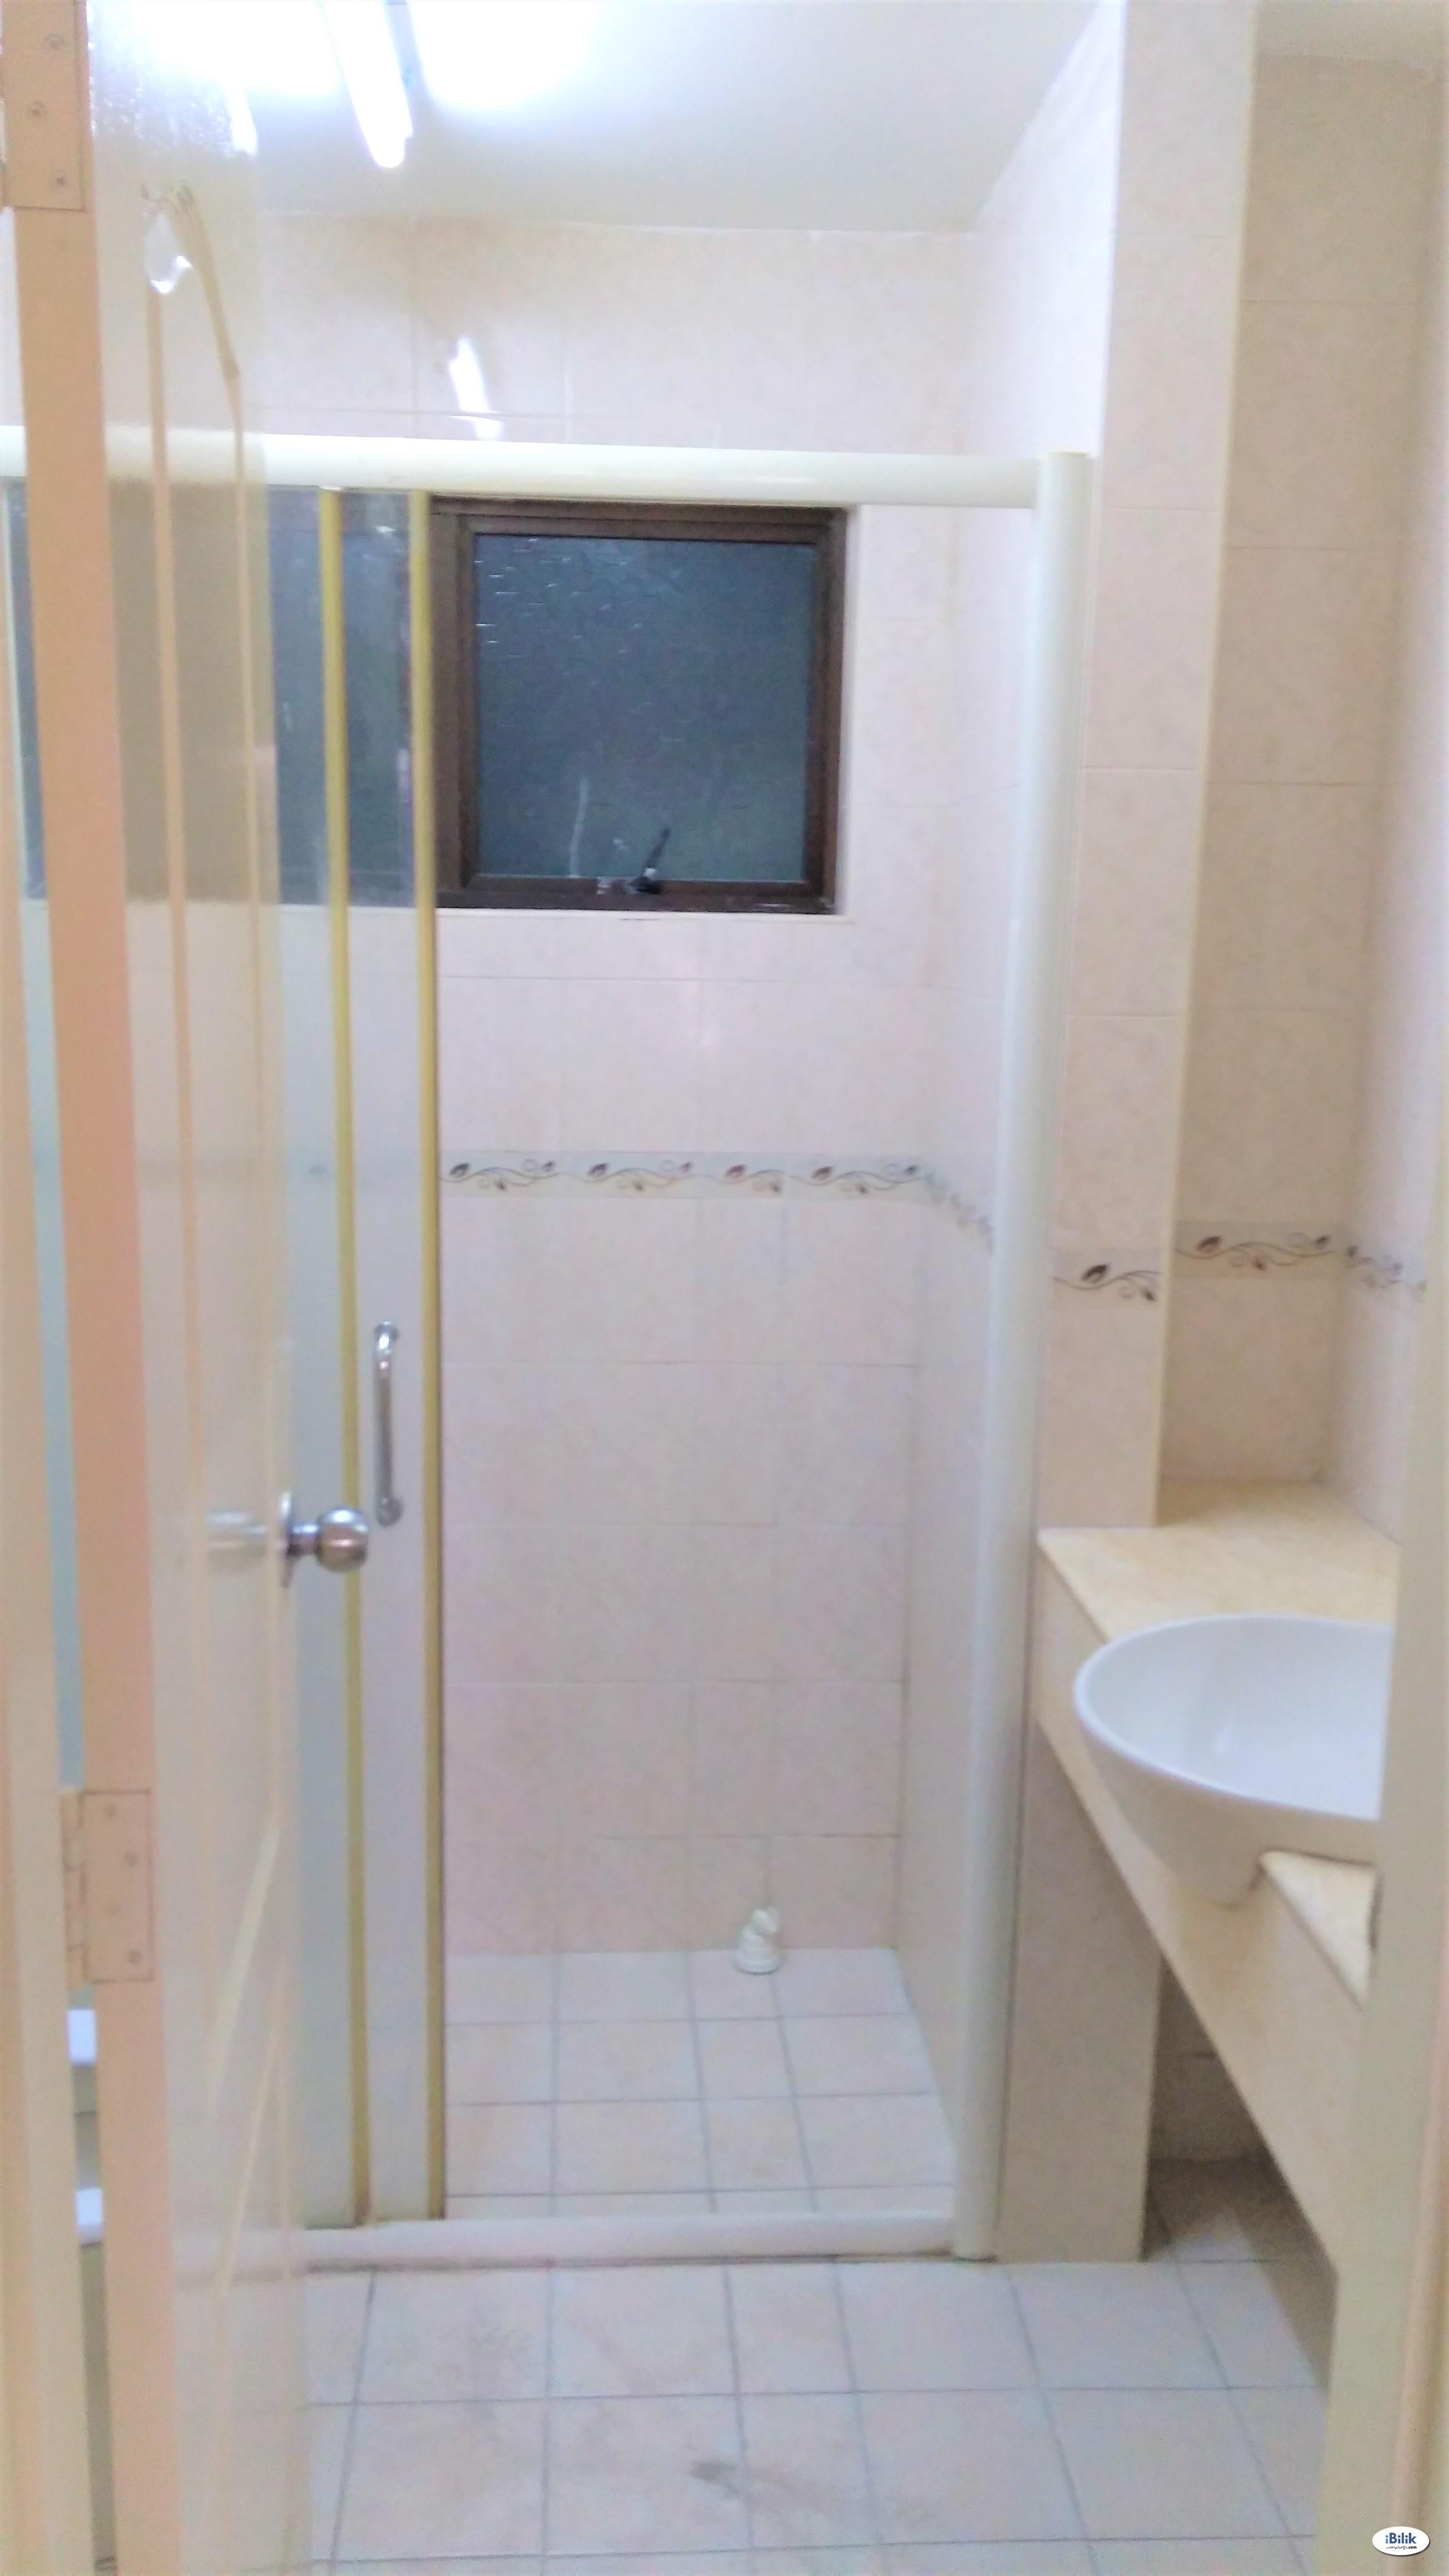 ❌ No Contract - Middle Room at Pelangi Utama, Bandar Utama